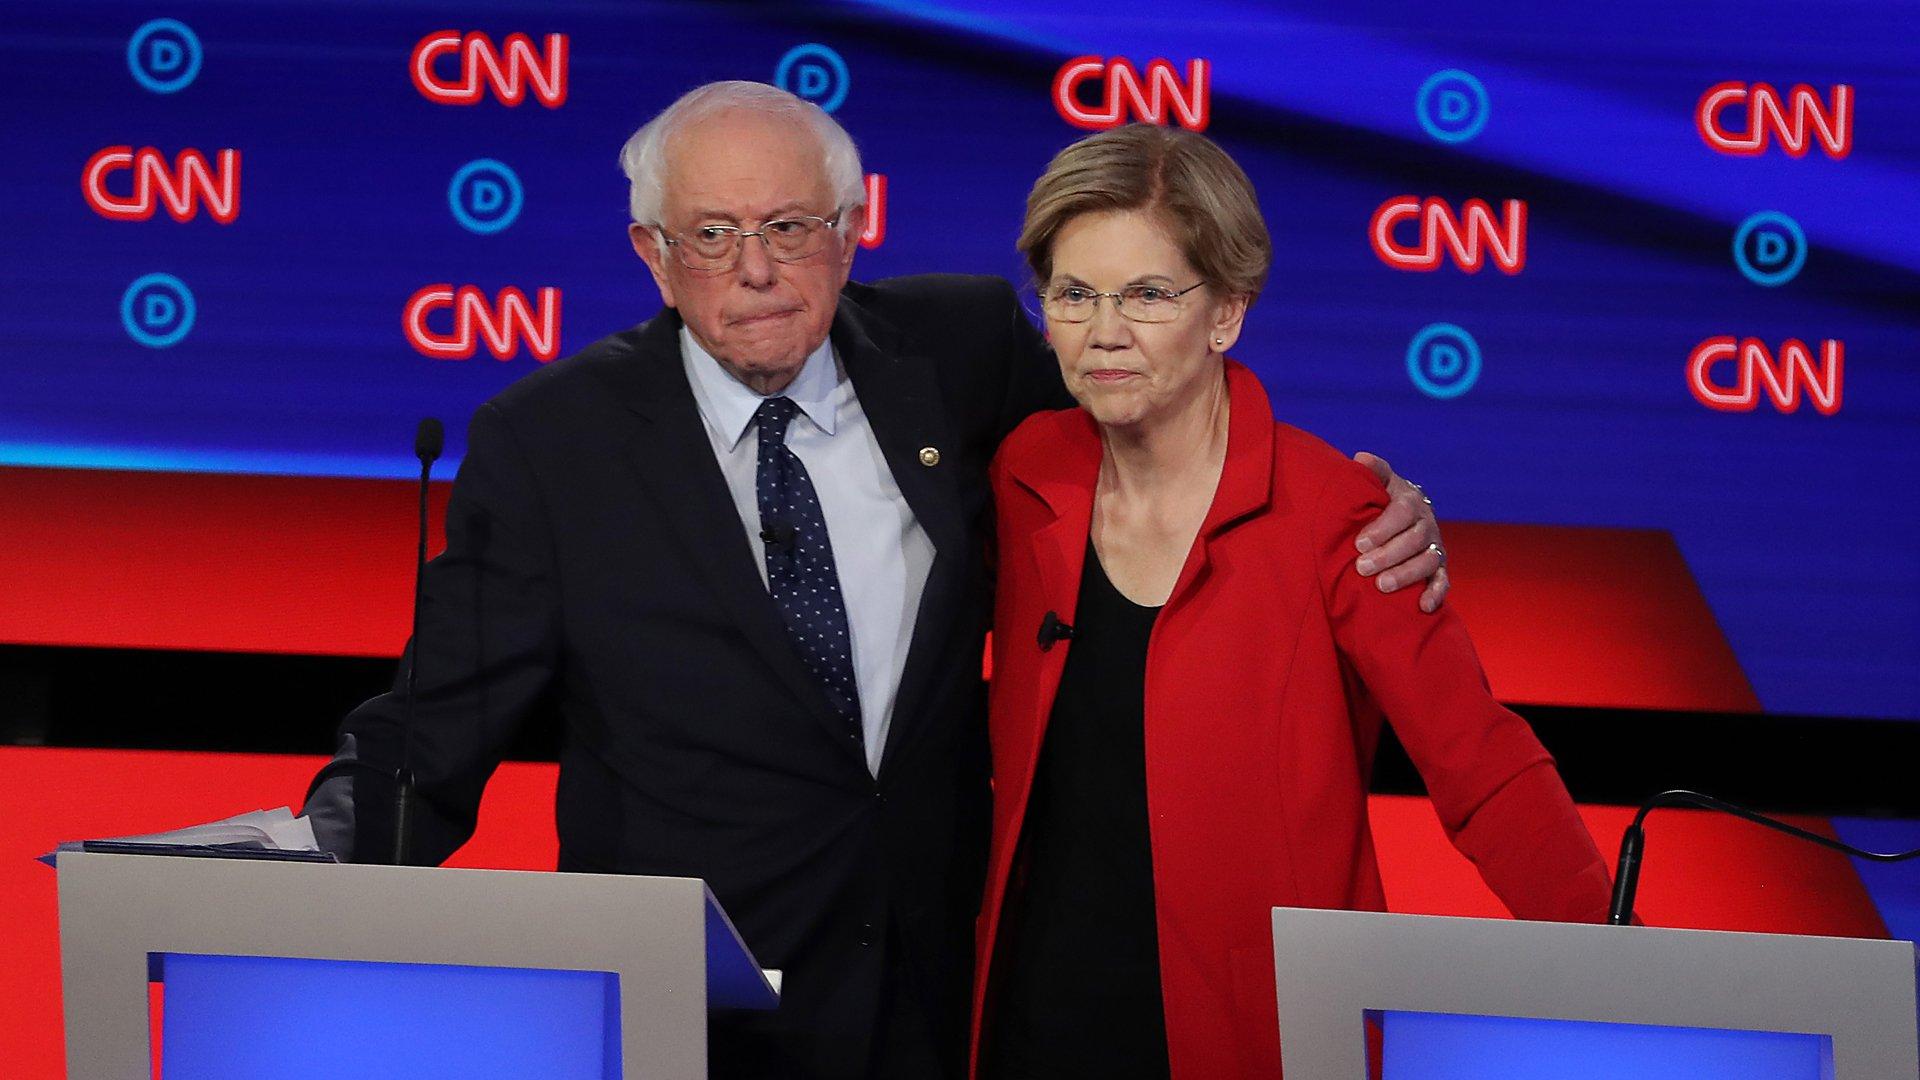 Democratic presidential candidate Sen. Bernie Sanders (I-VT) (L) and Sen. Elizabeth Warren (D-MA) embrace after the Democratic Presidential Debate at the Fox Theatre July 30, 2019 in Detroit. (Credit: Justin Sullivan/Getty Images)